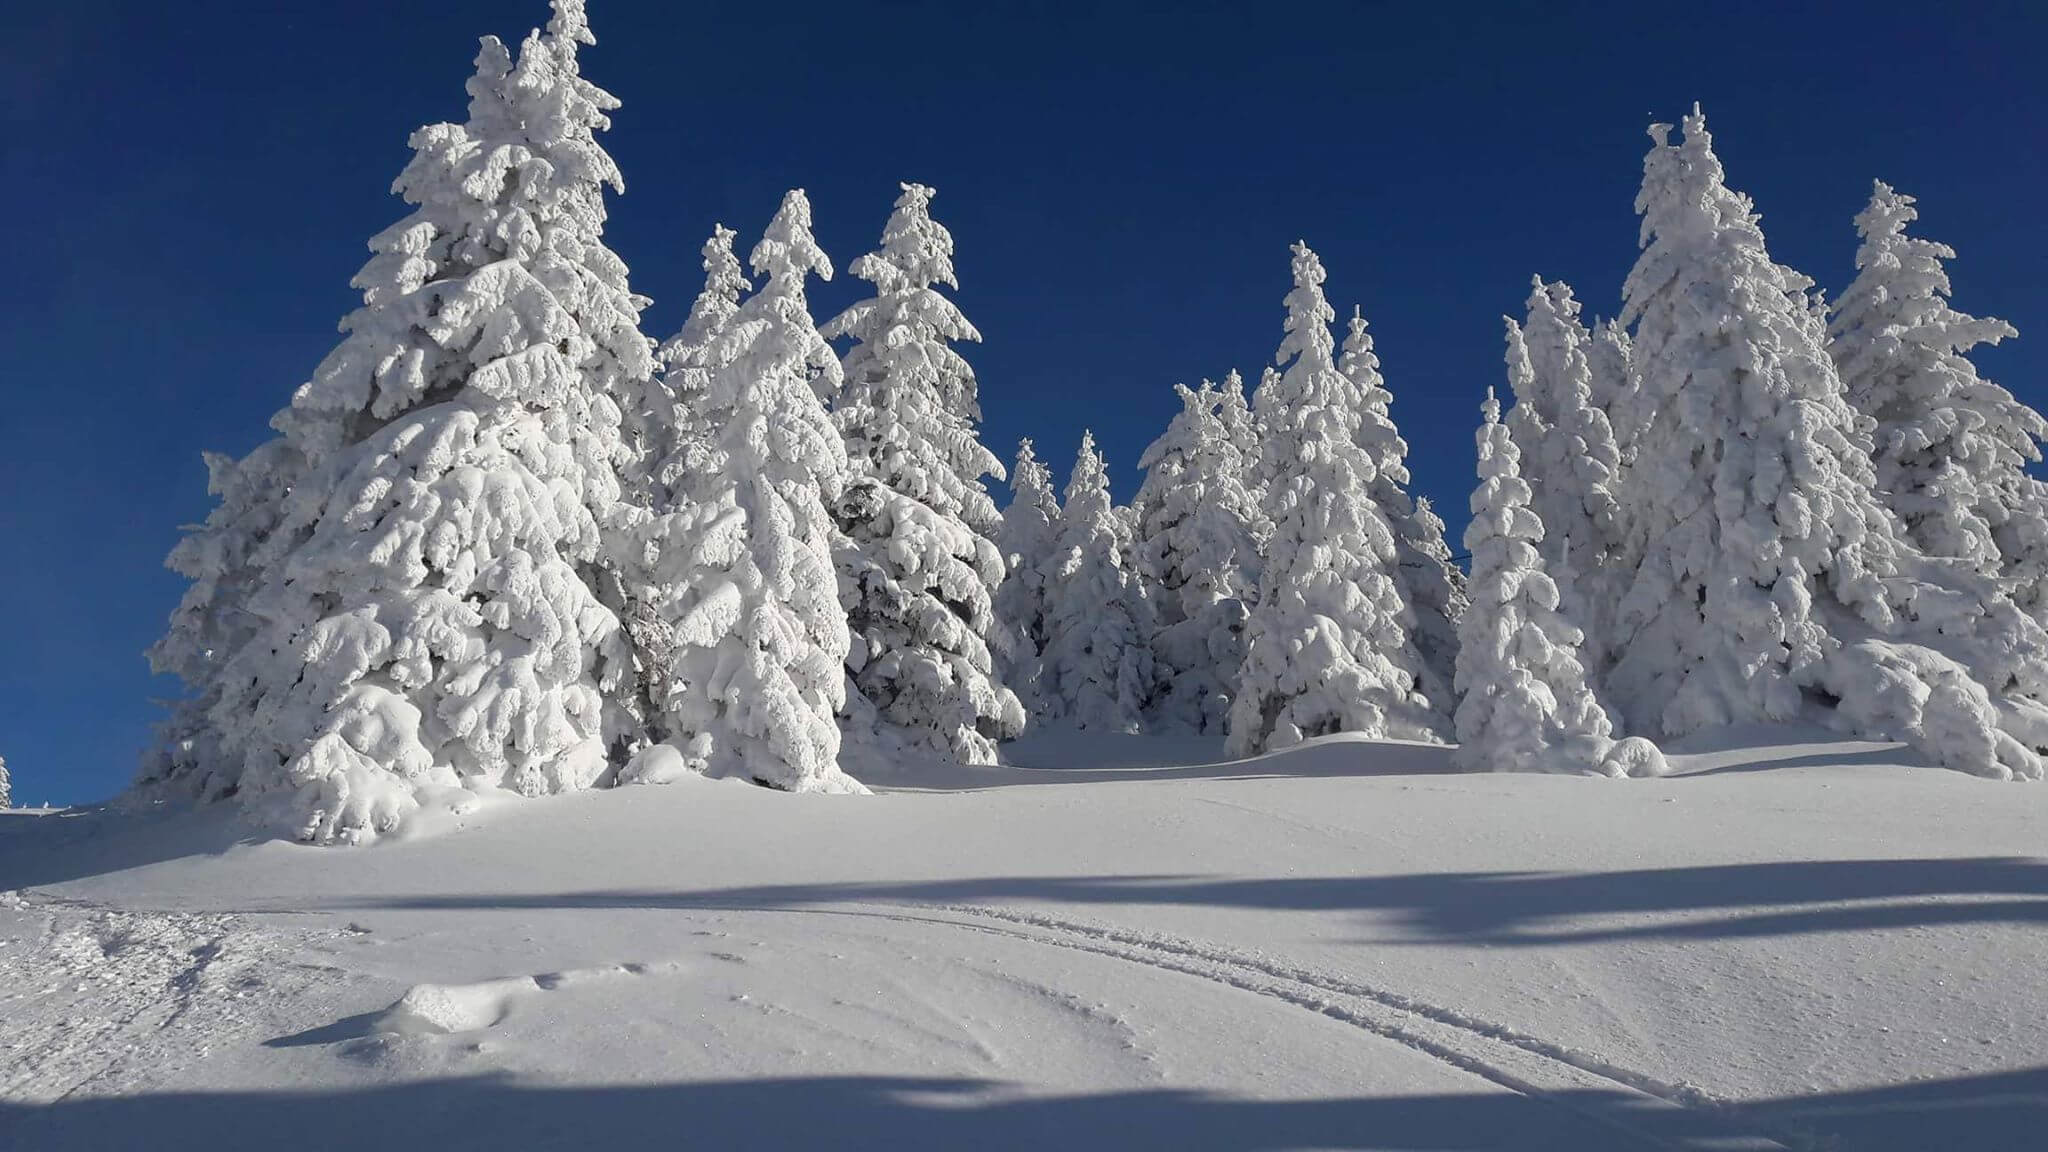 Snežna idila na Kopaoniku (2) - 21. decembar 2017